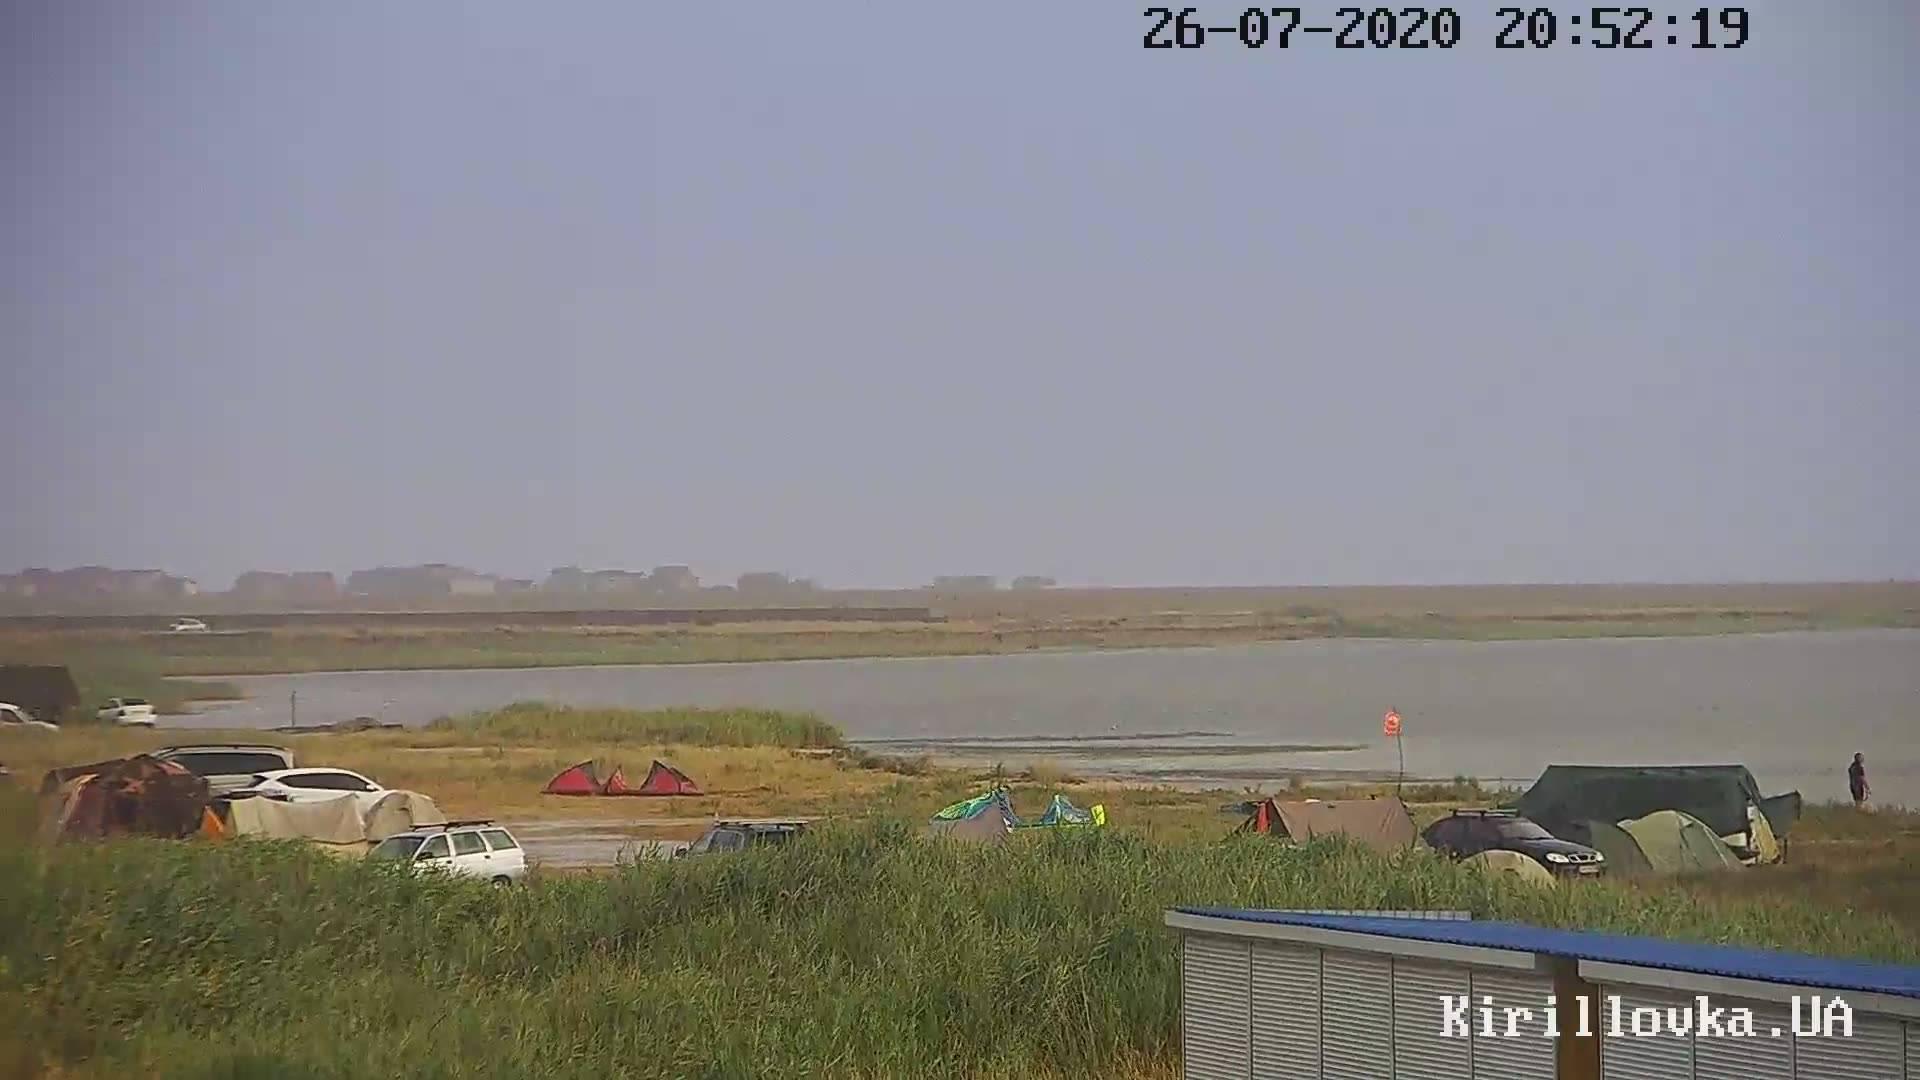 Webcam Kyrylivka: Кайтсерфинг и виндсерфинг на лимане Фед